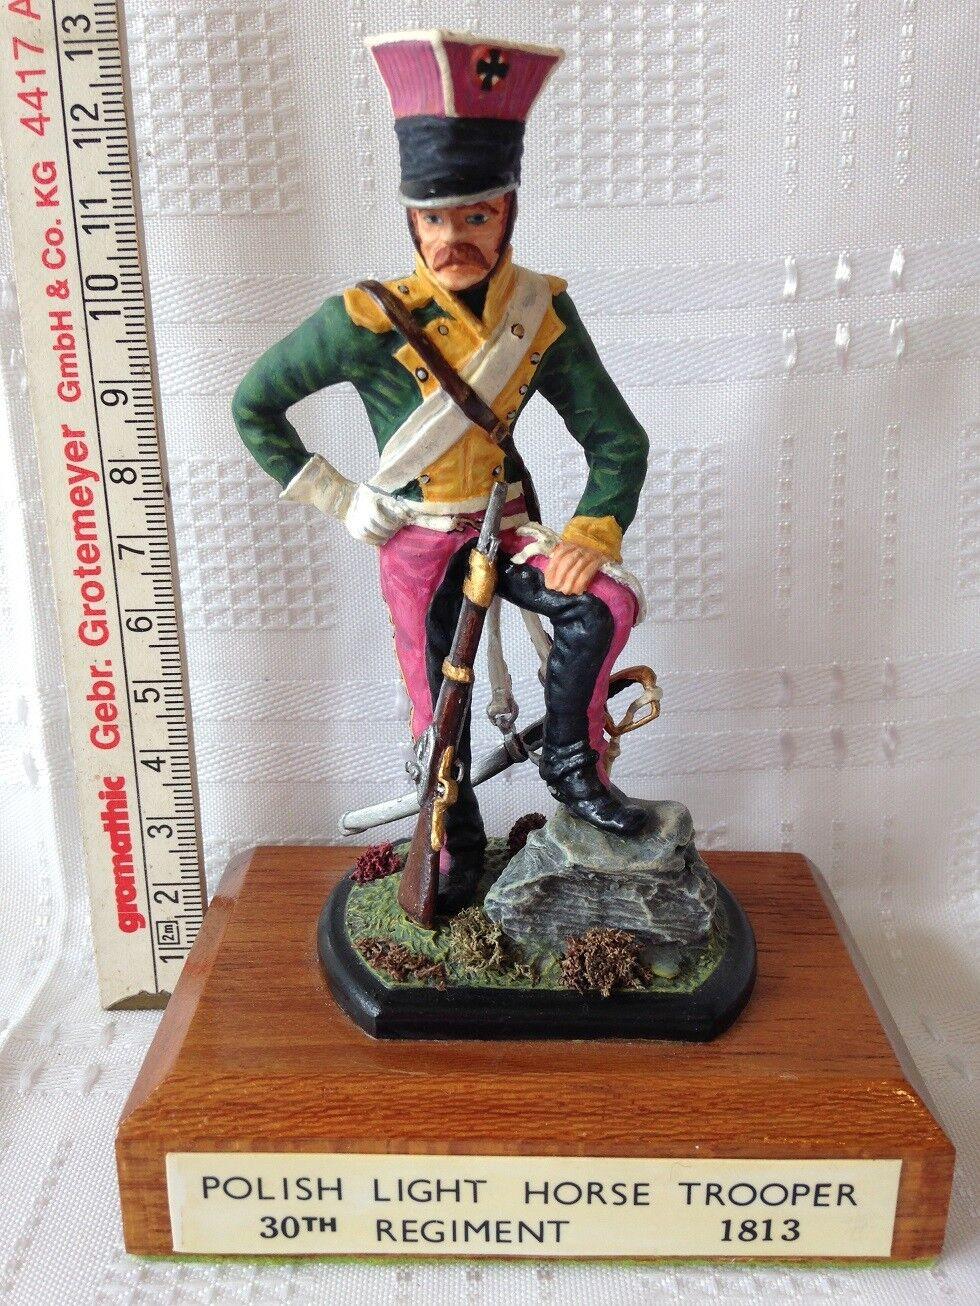 POLISH LIGHT HORSE TROOPER 30th REGT - 1813. 115mm Die-Cast Figure. FREE UK POST